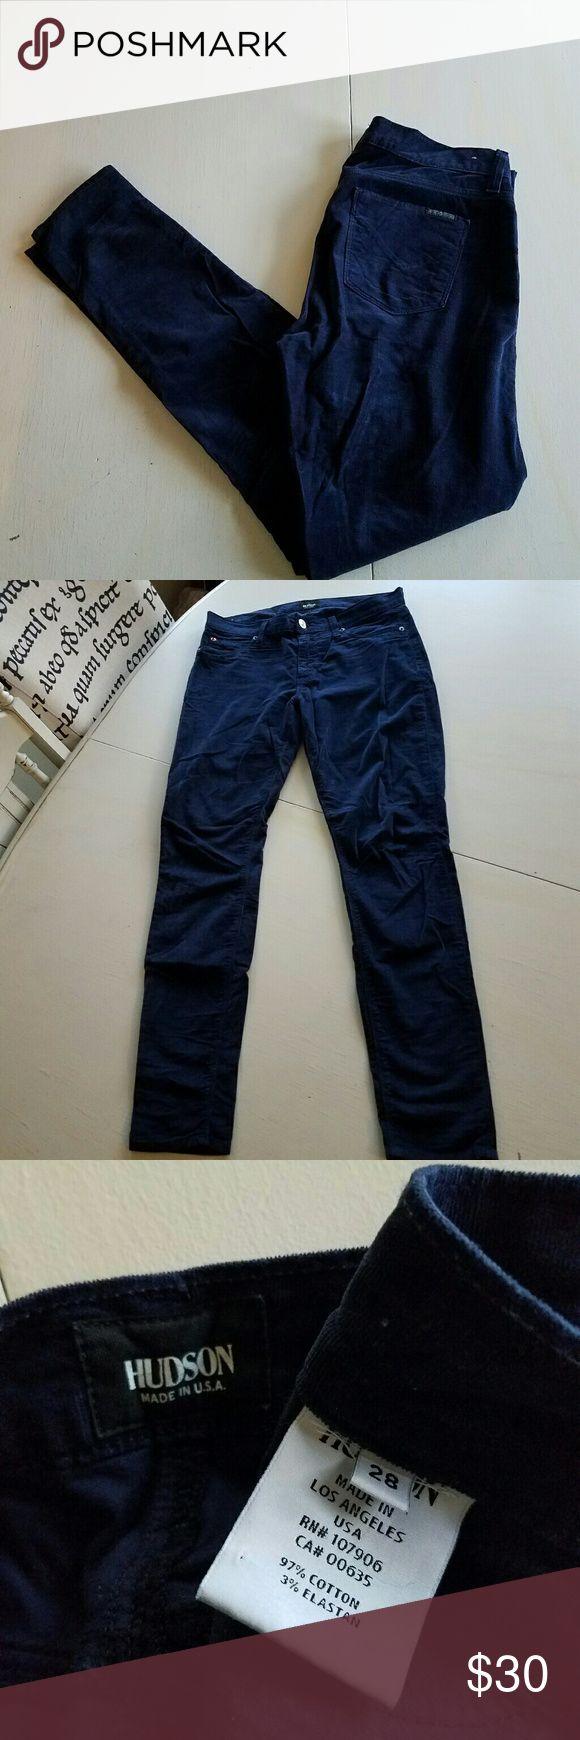 Hudson Micro Cord Pants Adorable skinny Micro Cord Hudson pants.  Dark navy. No trades. Hudson Jeans Pants Skinny